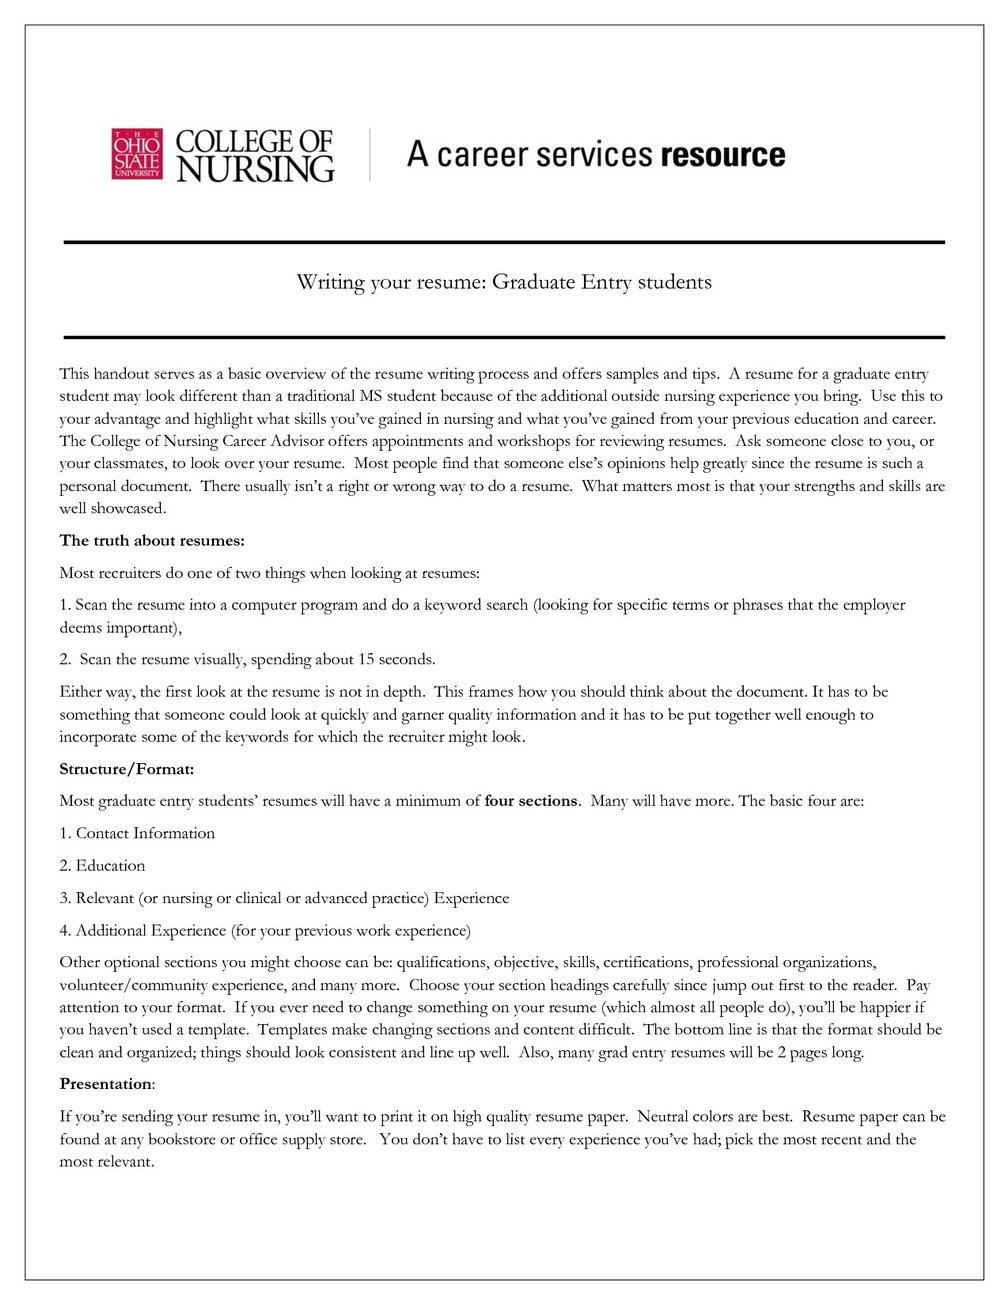 Free Nurse Resume Template Downloads